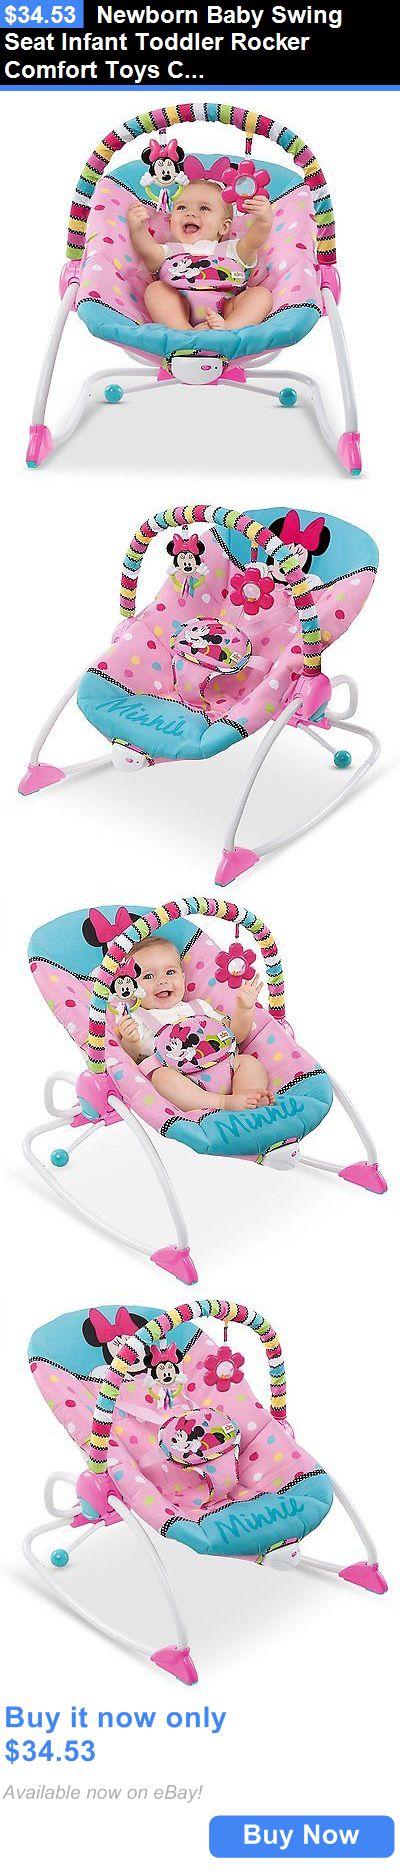 baby kid stuff Newborn Baby Swing Seat Infant Toddler